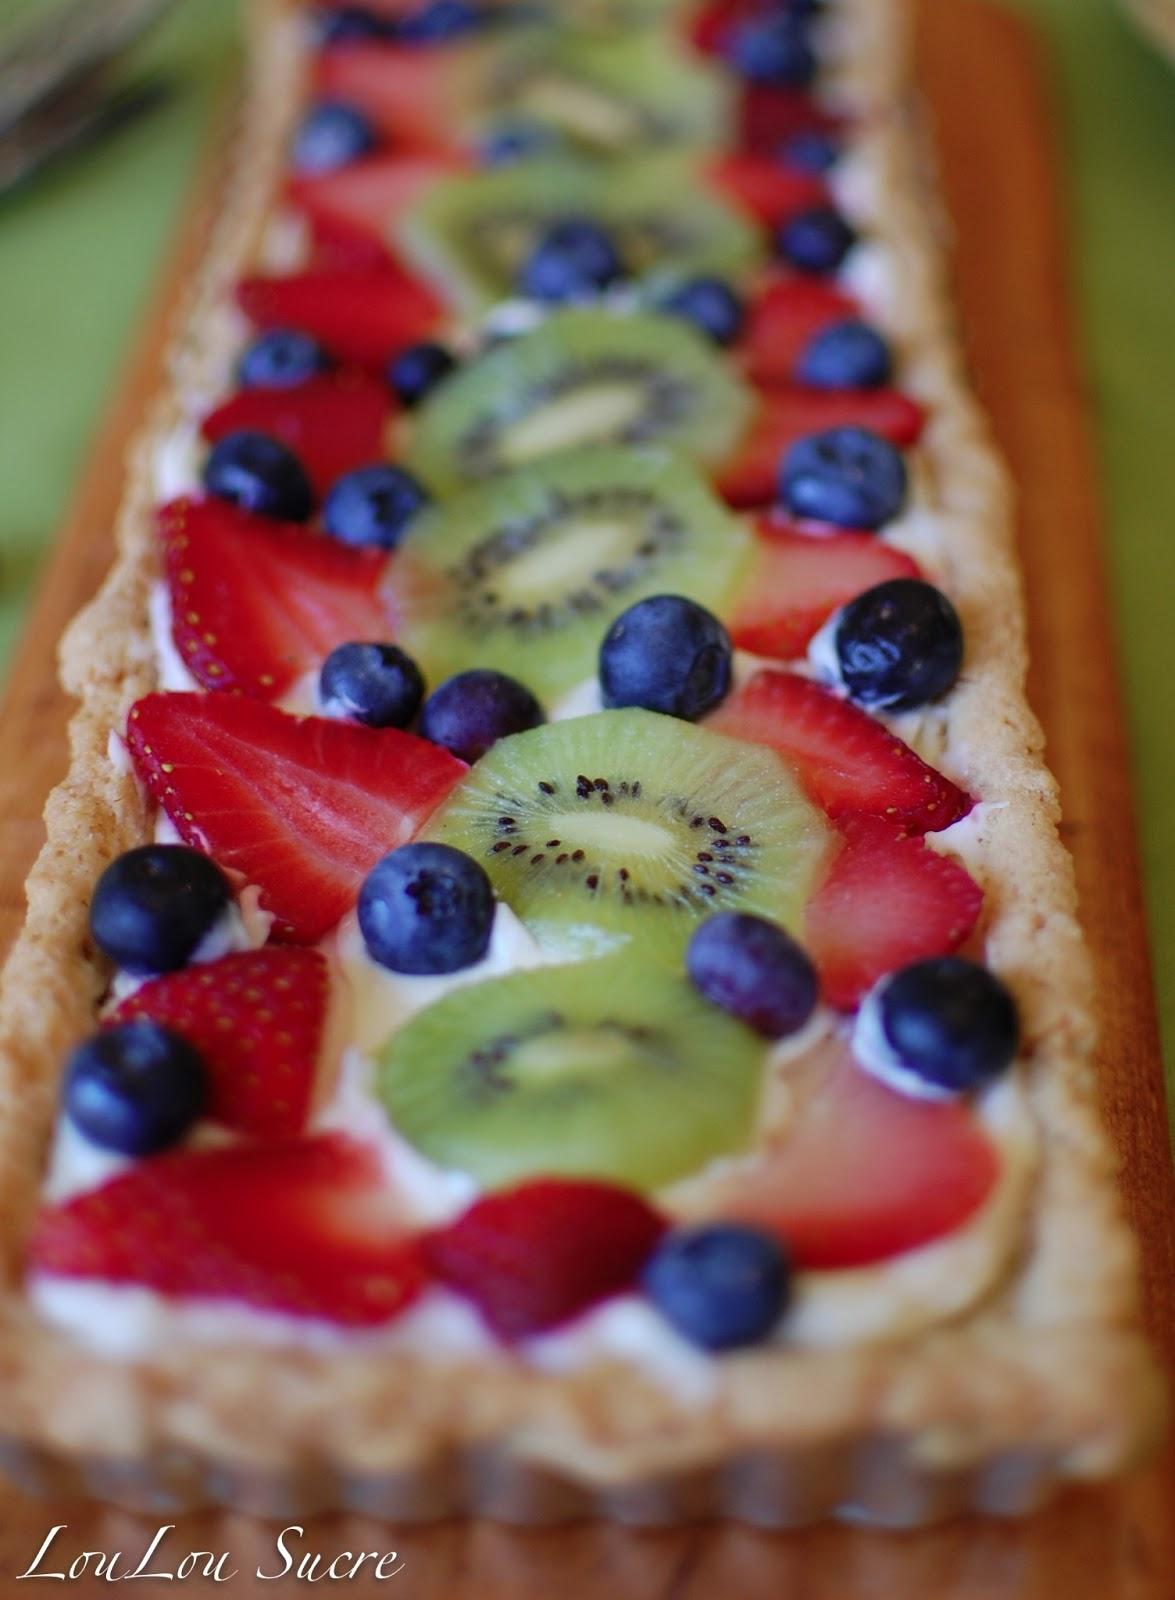 pizza pizza season i ng fruit salsa fruit wands fruit pizza 1 thumb ...